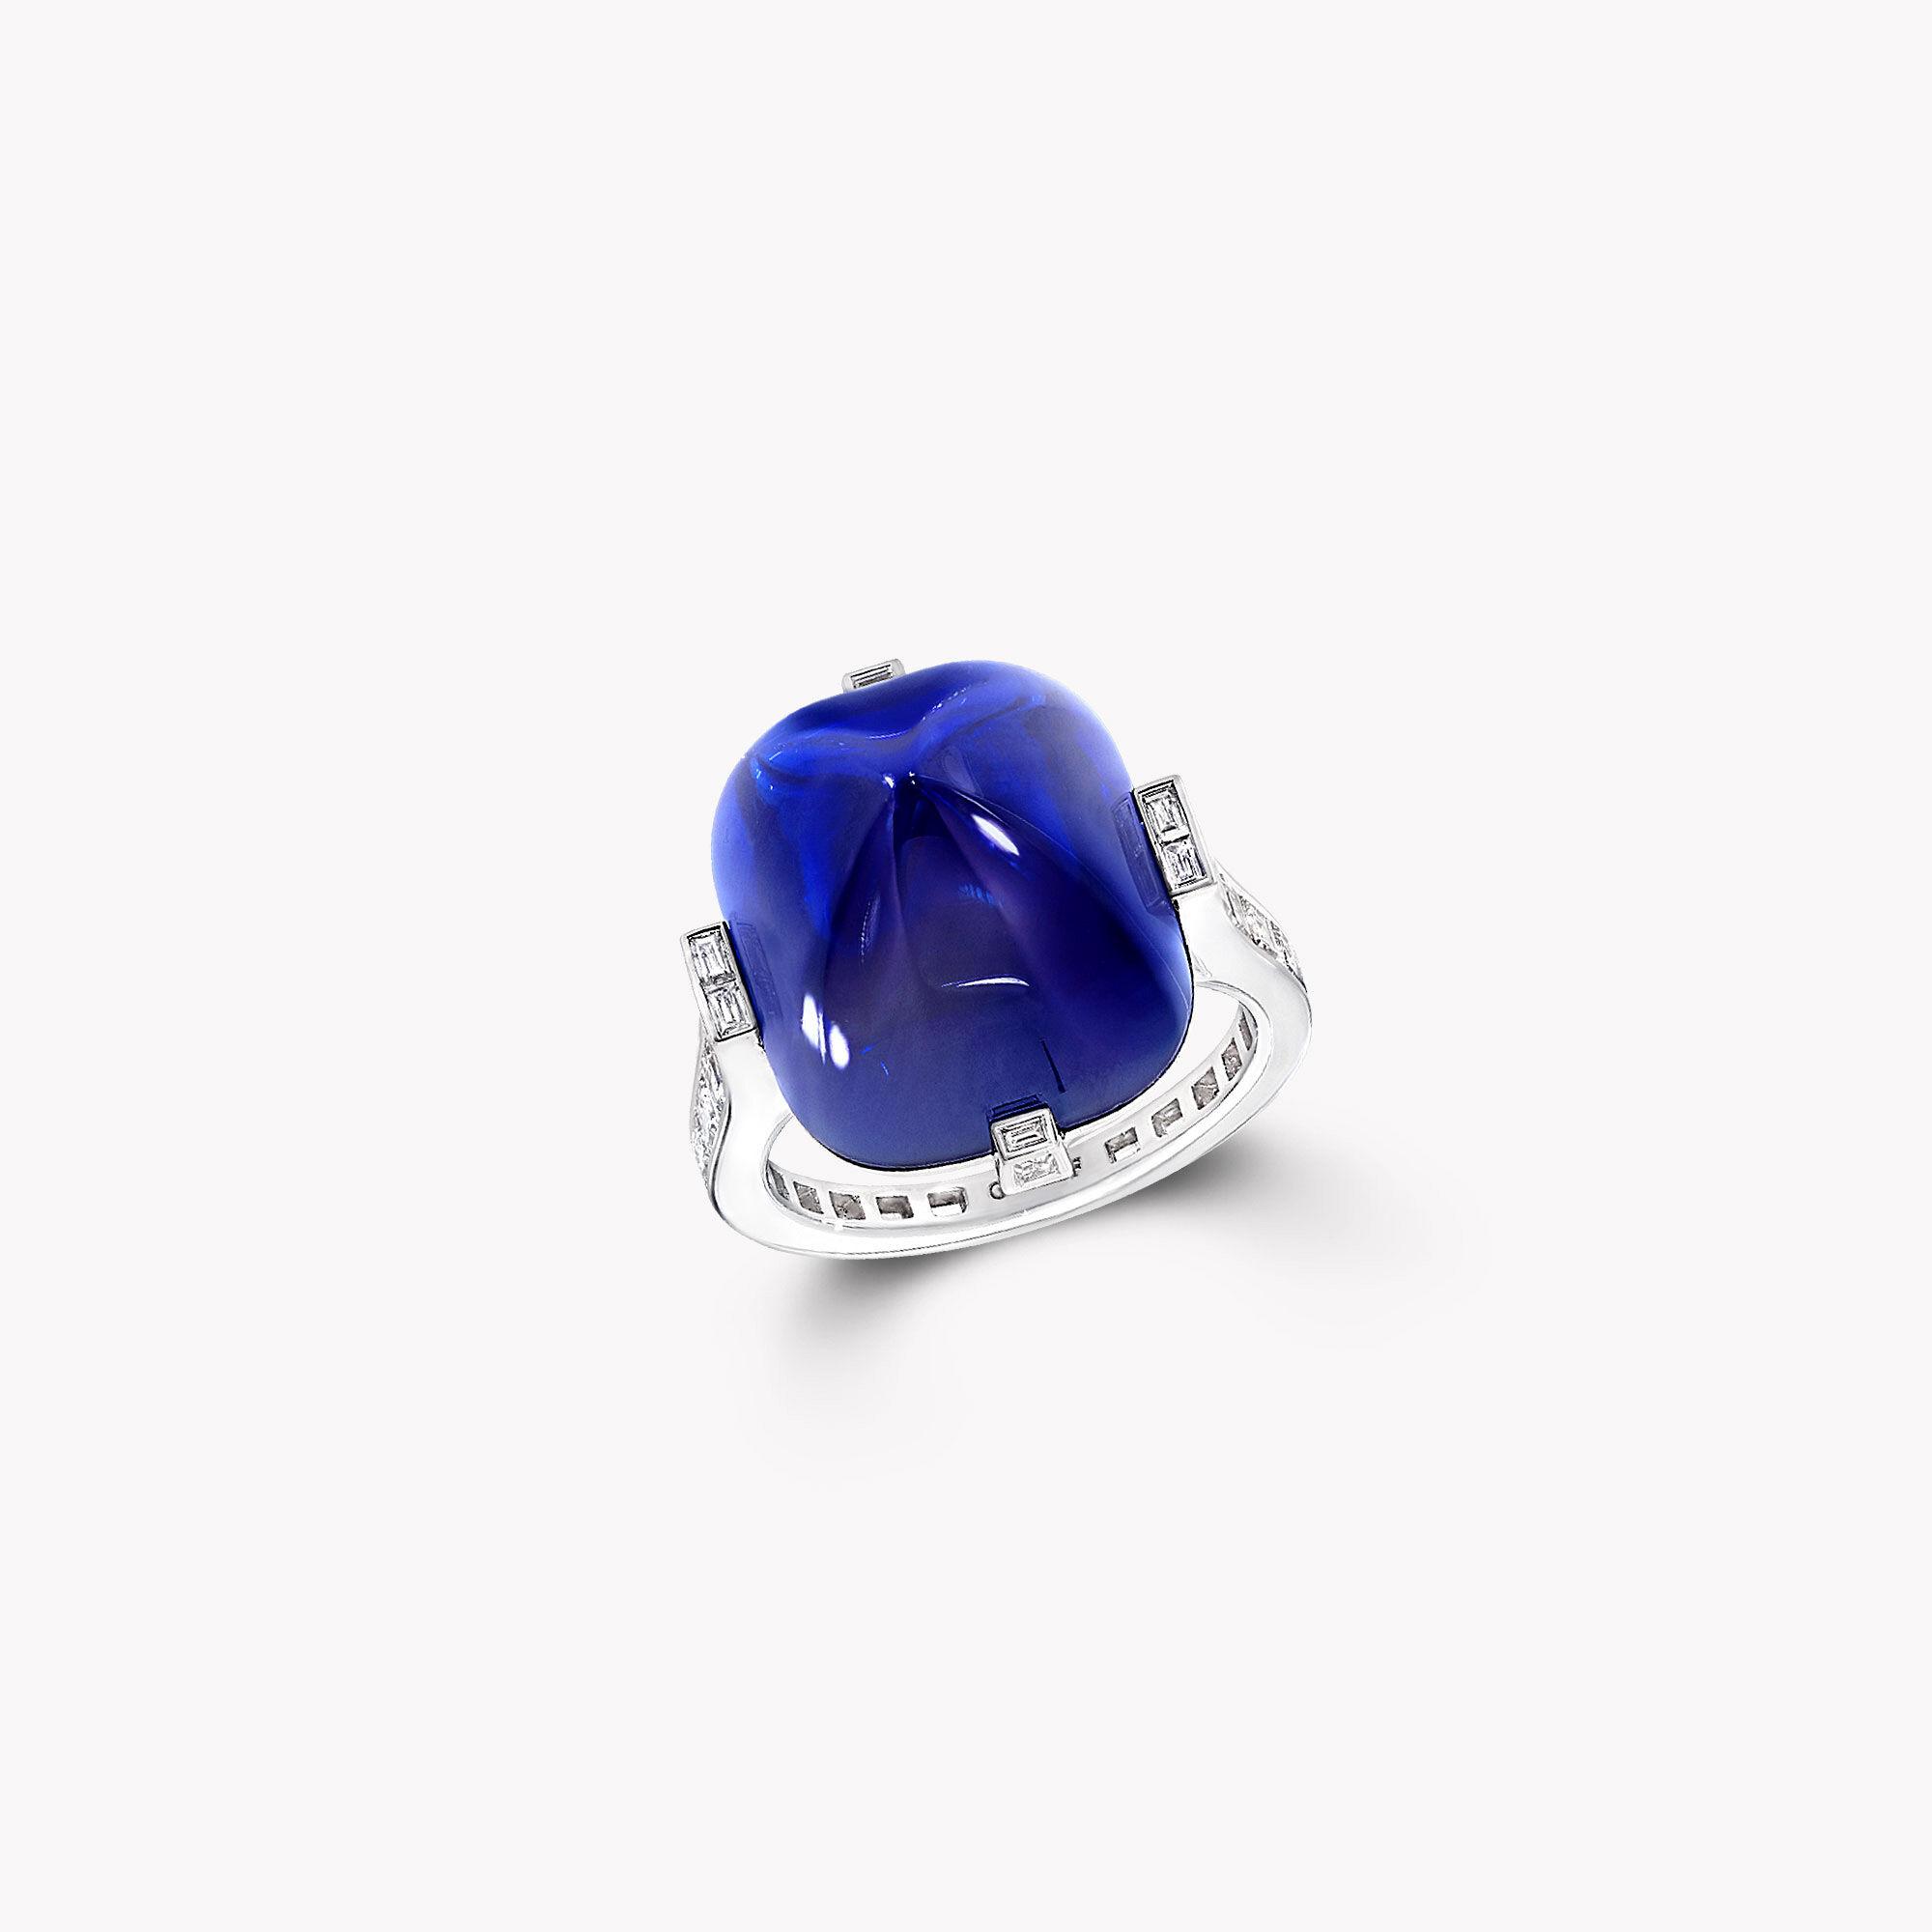 A Graff cabochon Kashmir sapphire and white diamond high jewellery ring